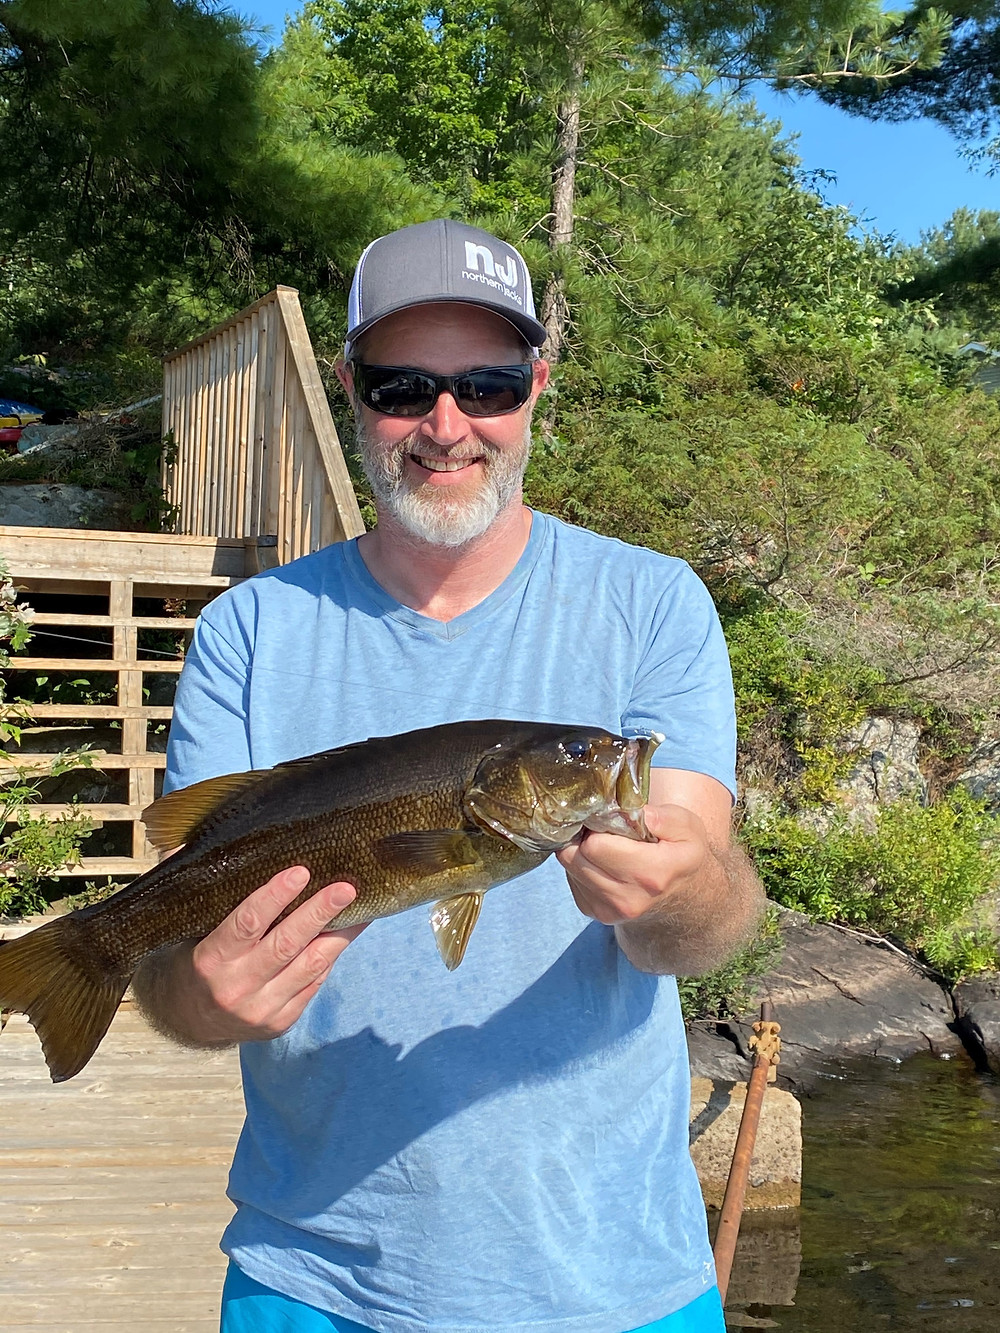 Nice bass caught in the Muskoka region, Ontario, Canada